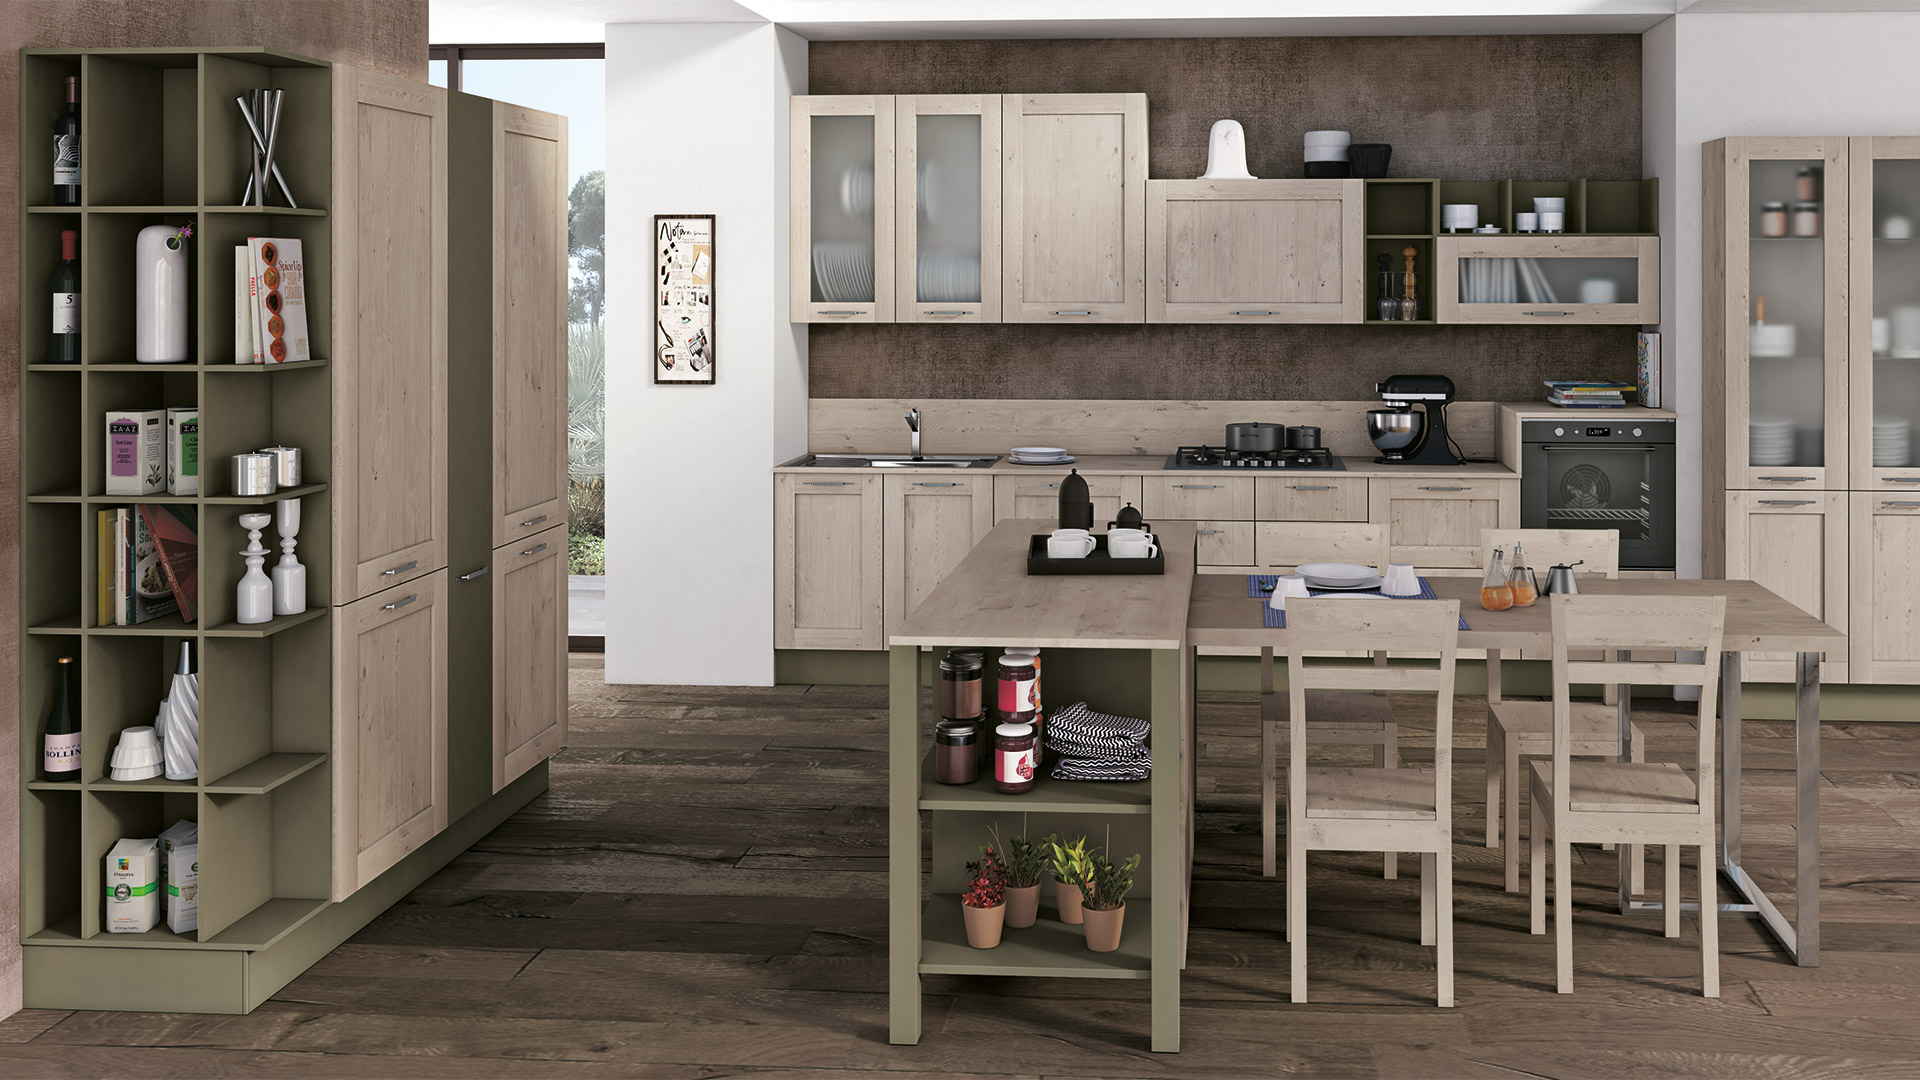 2591_kyra-telaio-cucina-ambientata-18